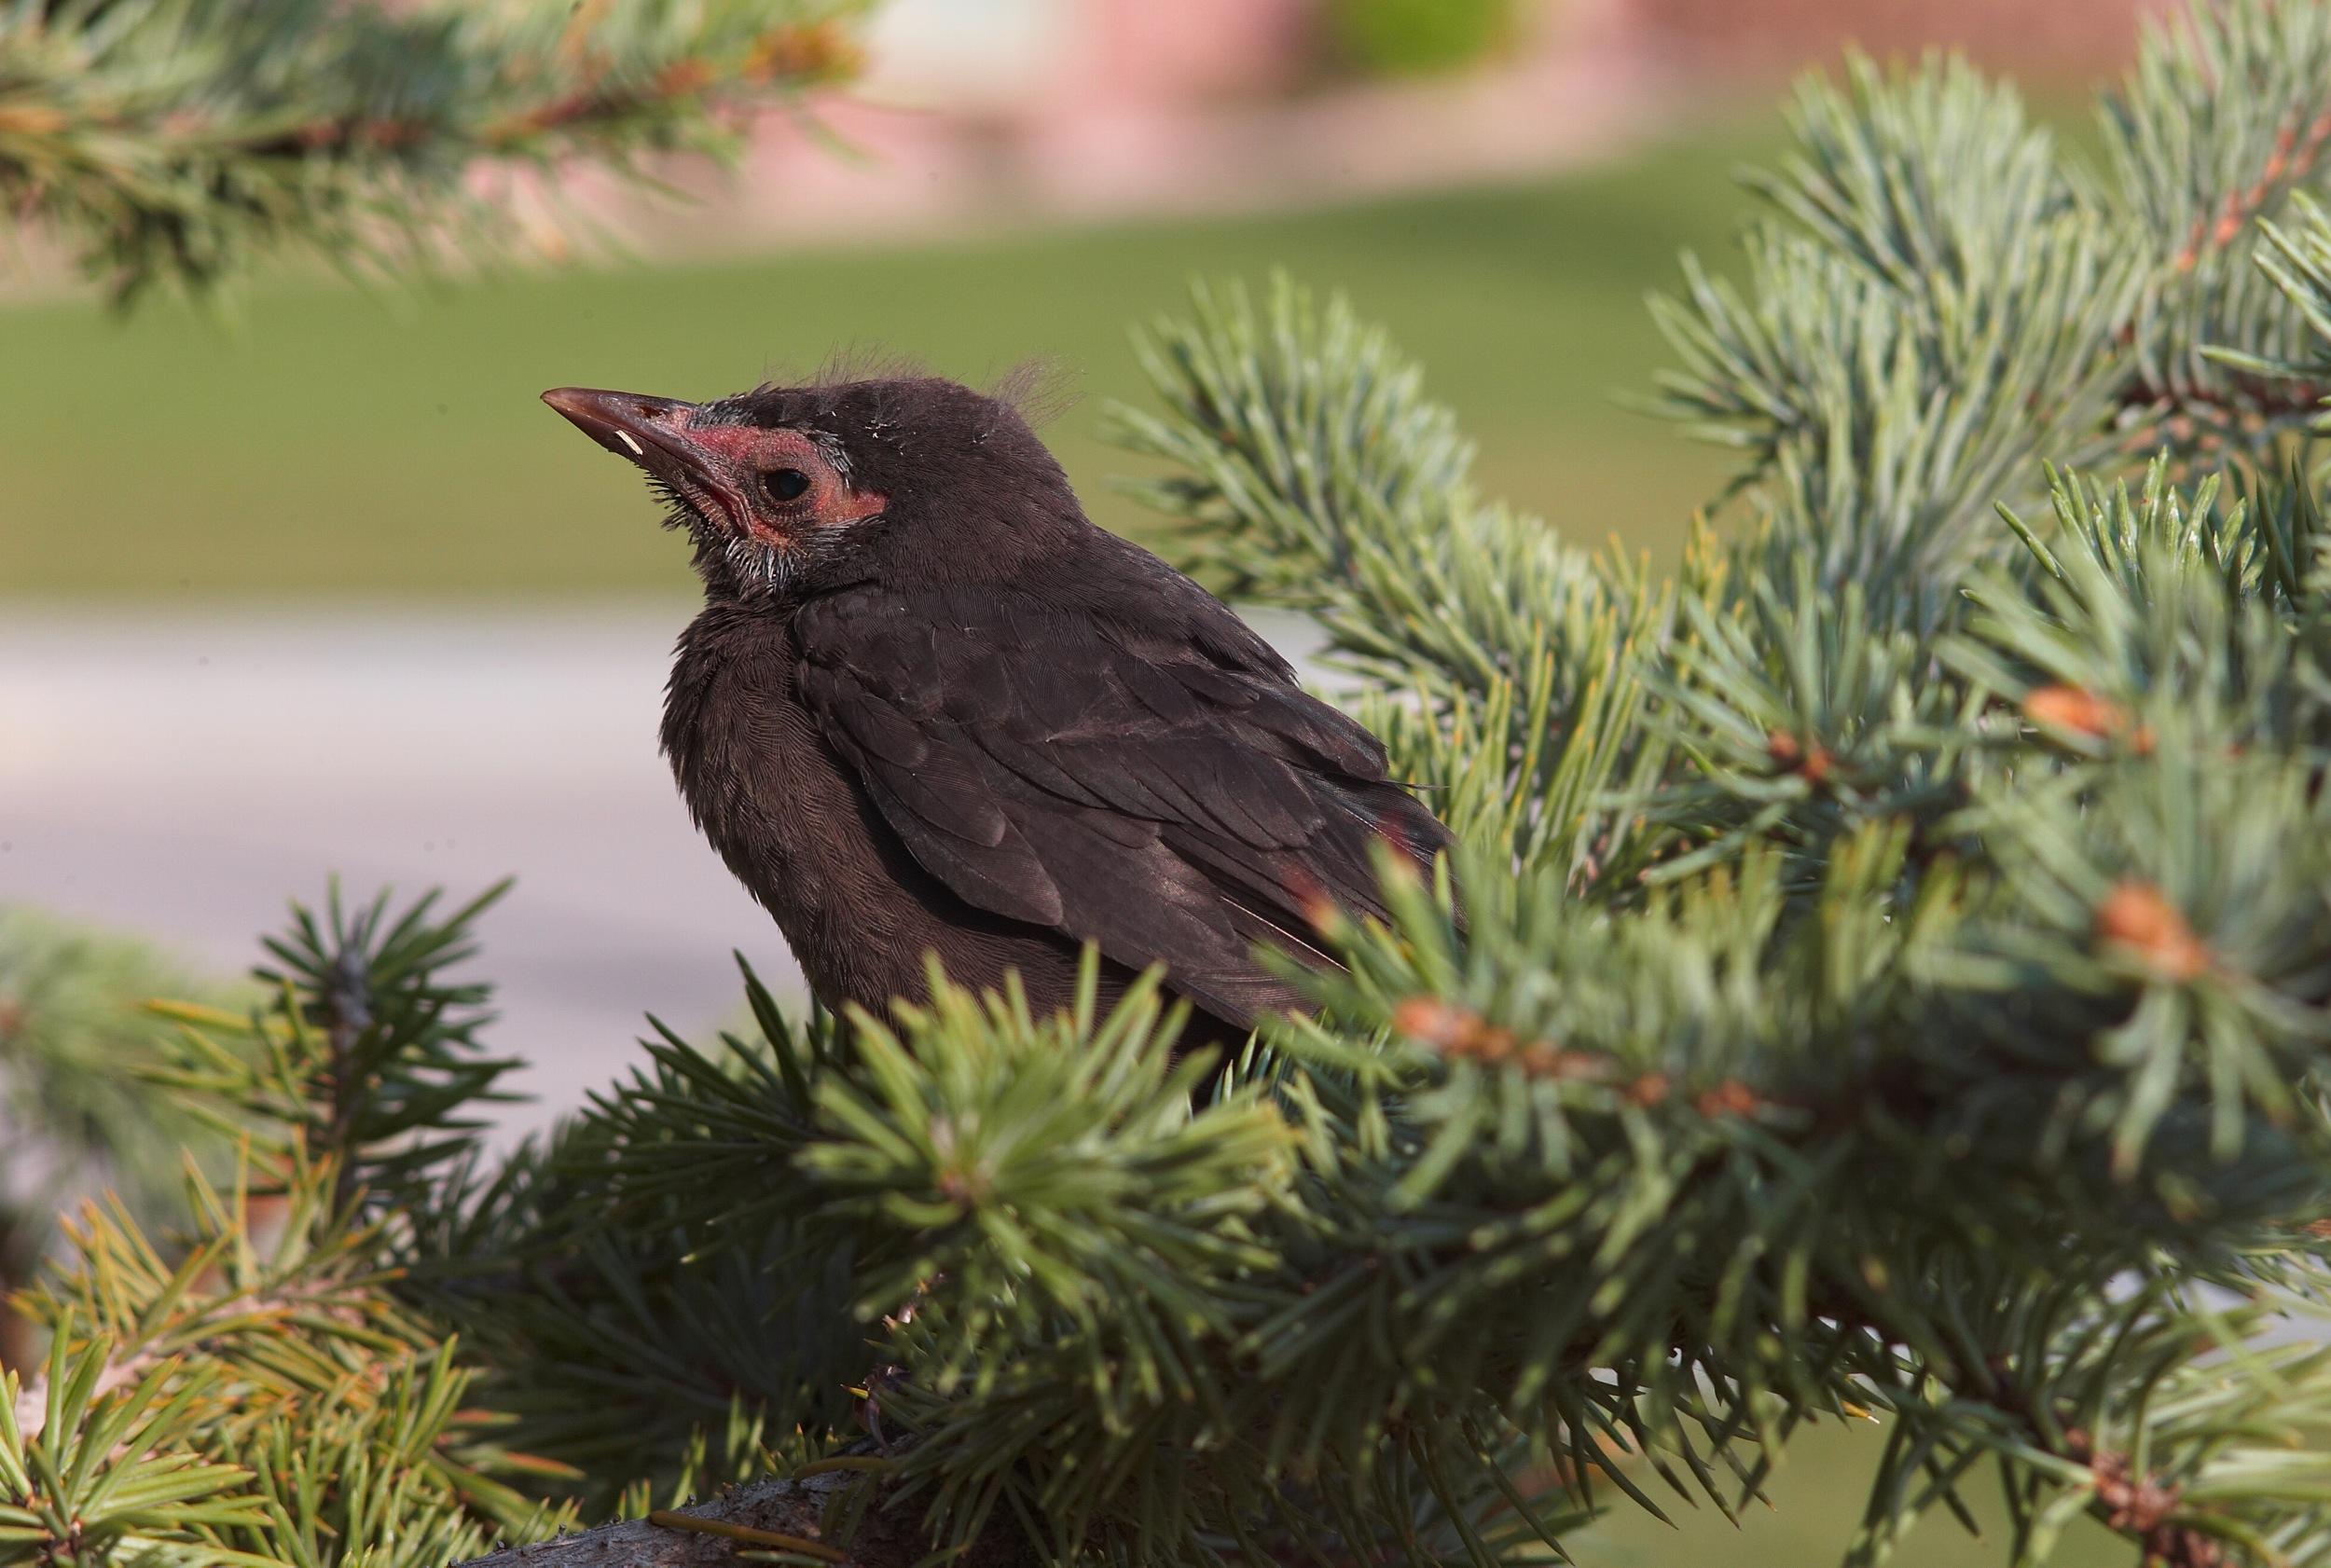 fledgling grackle - photo #38